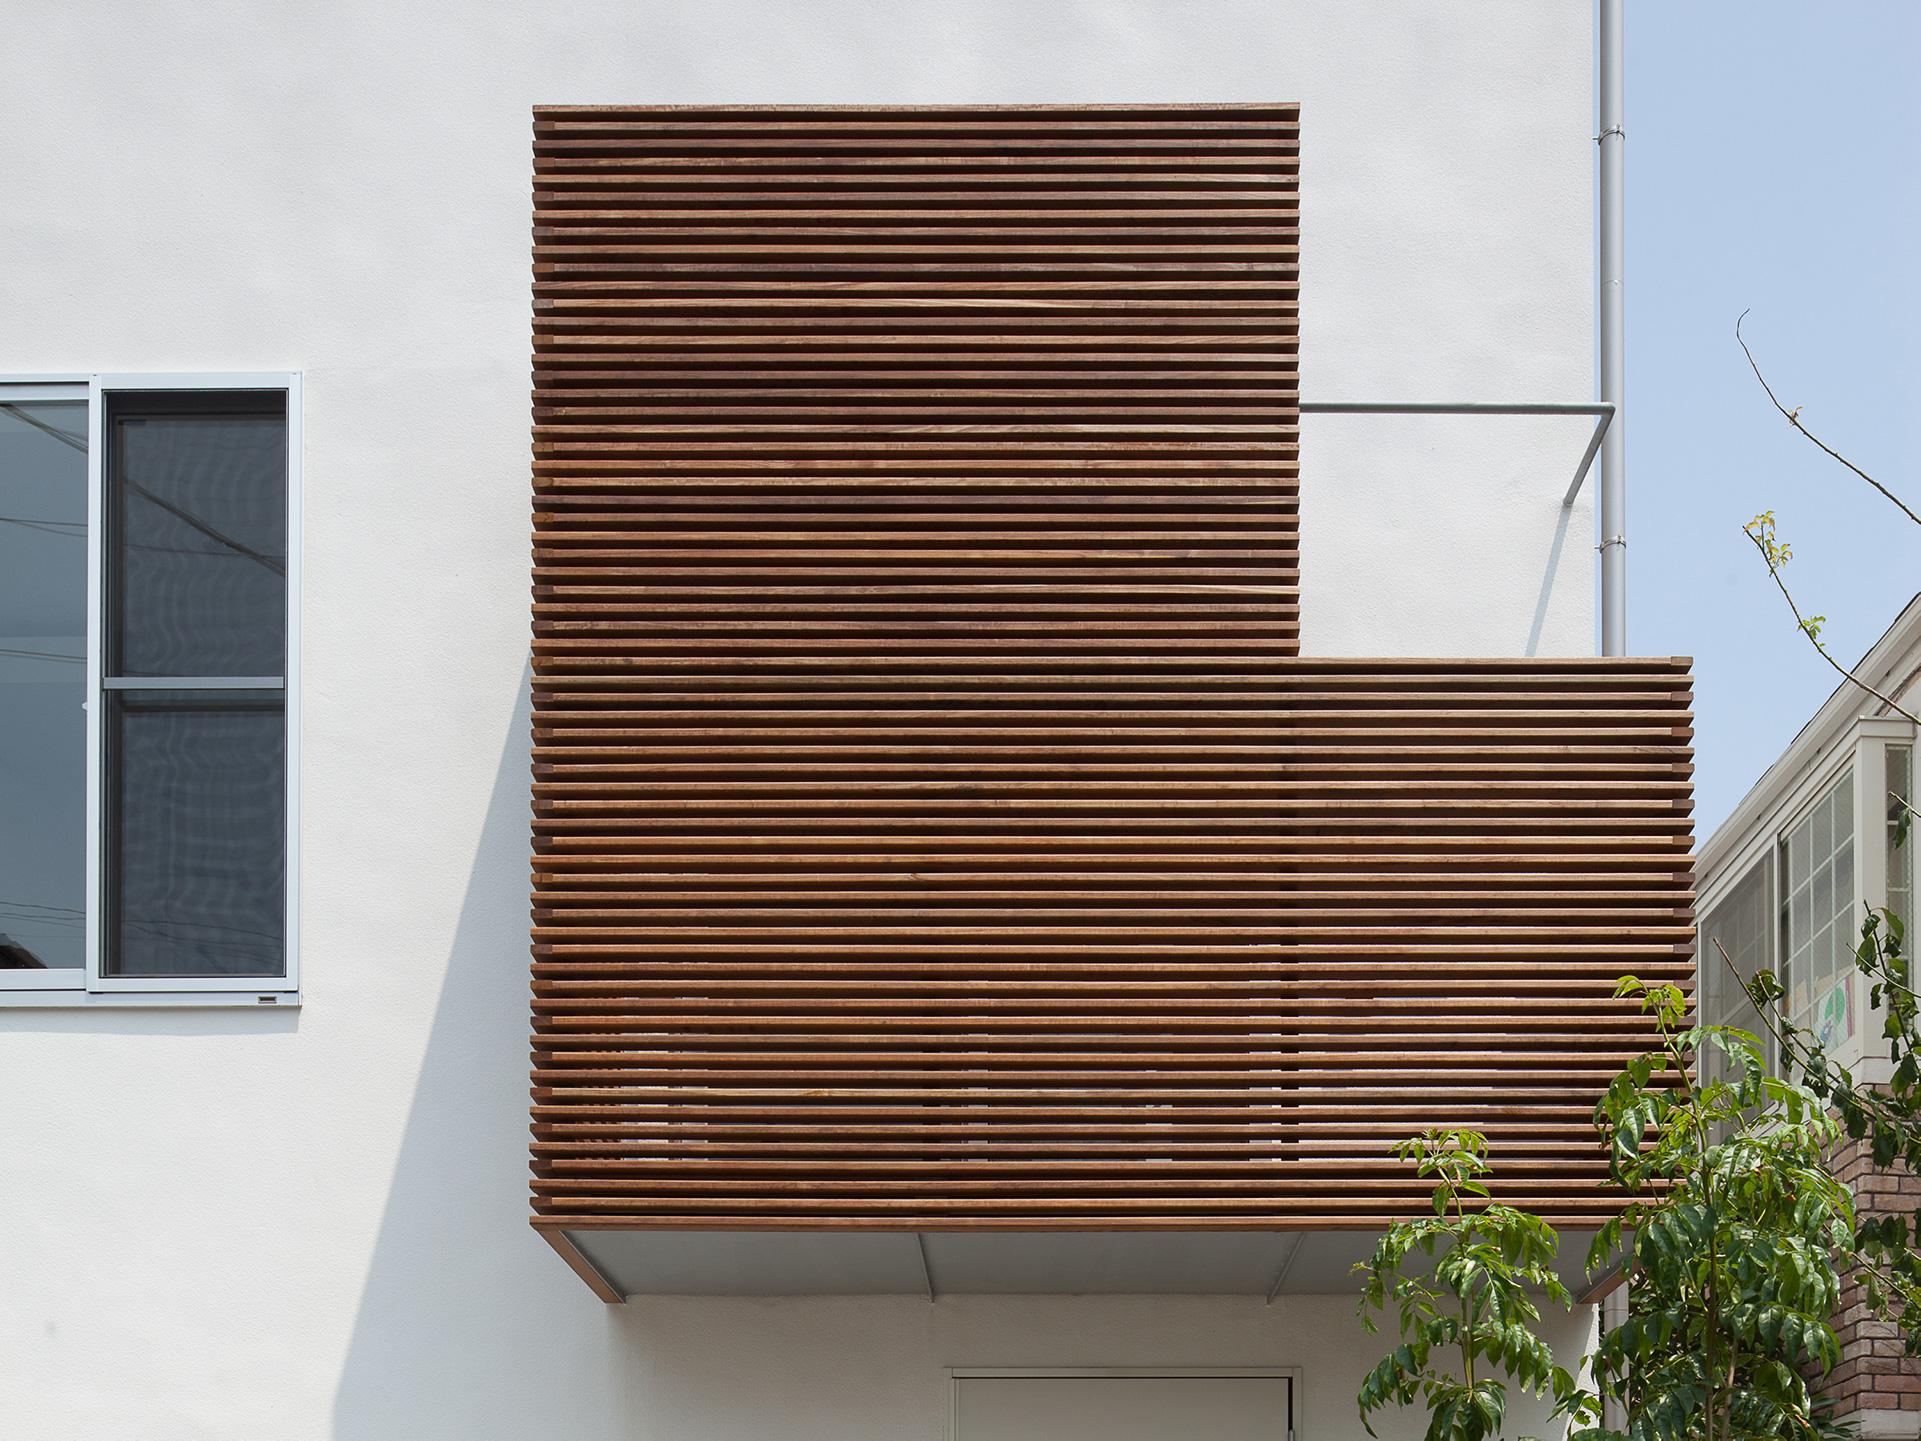 品川区「SDY」の狭小住宅 完成写真01